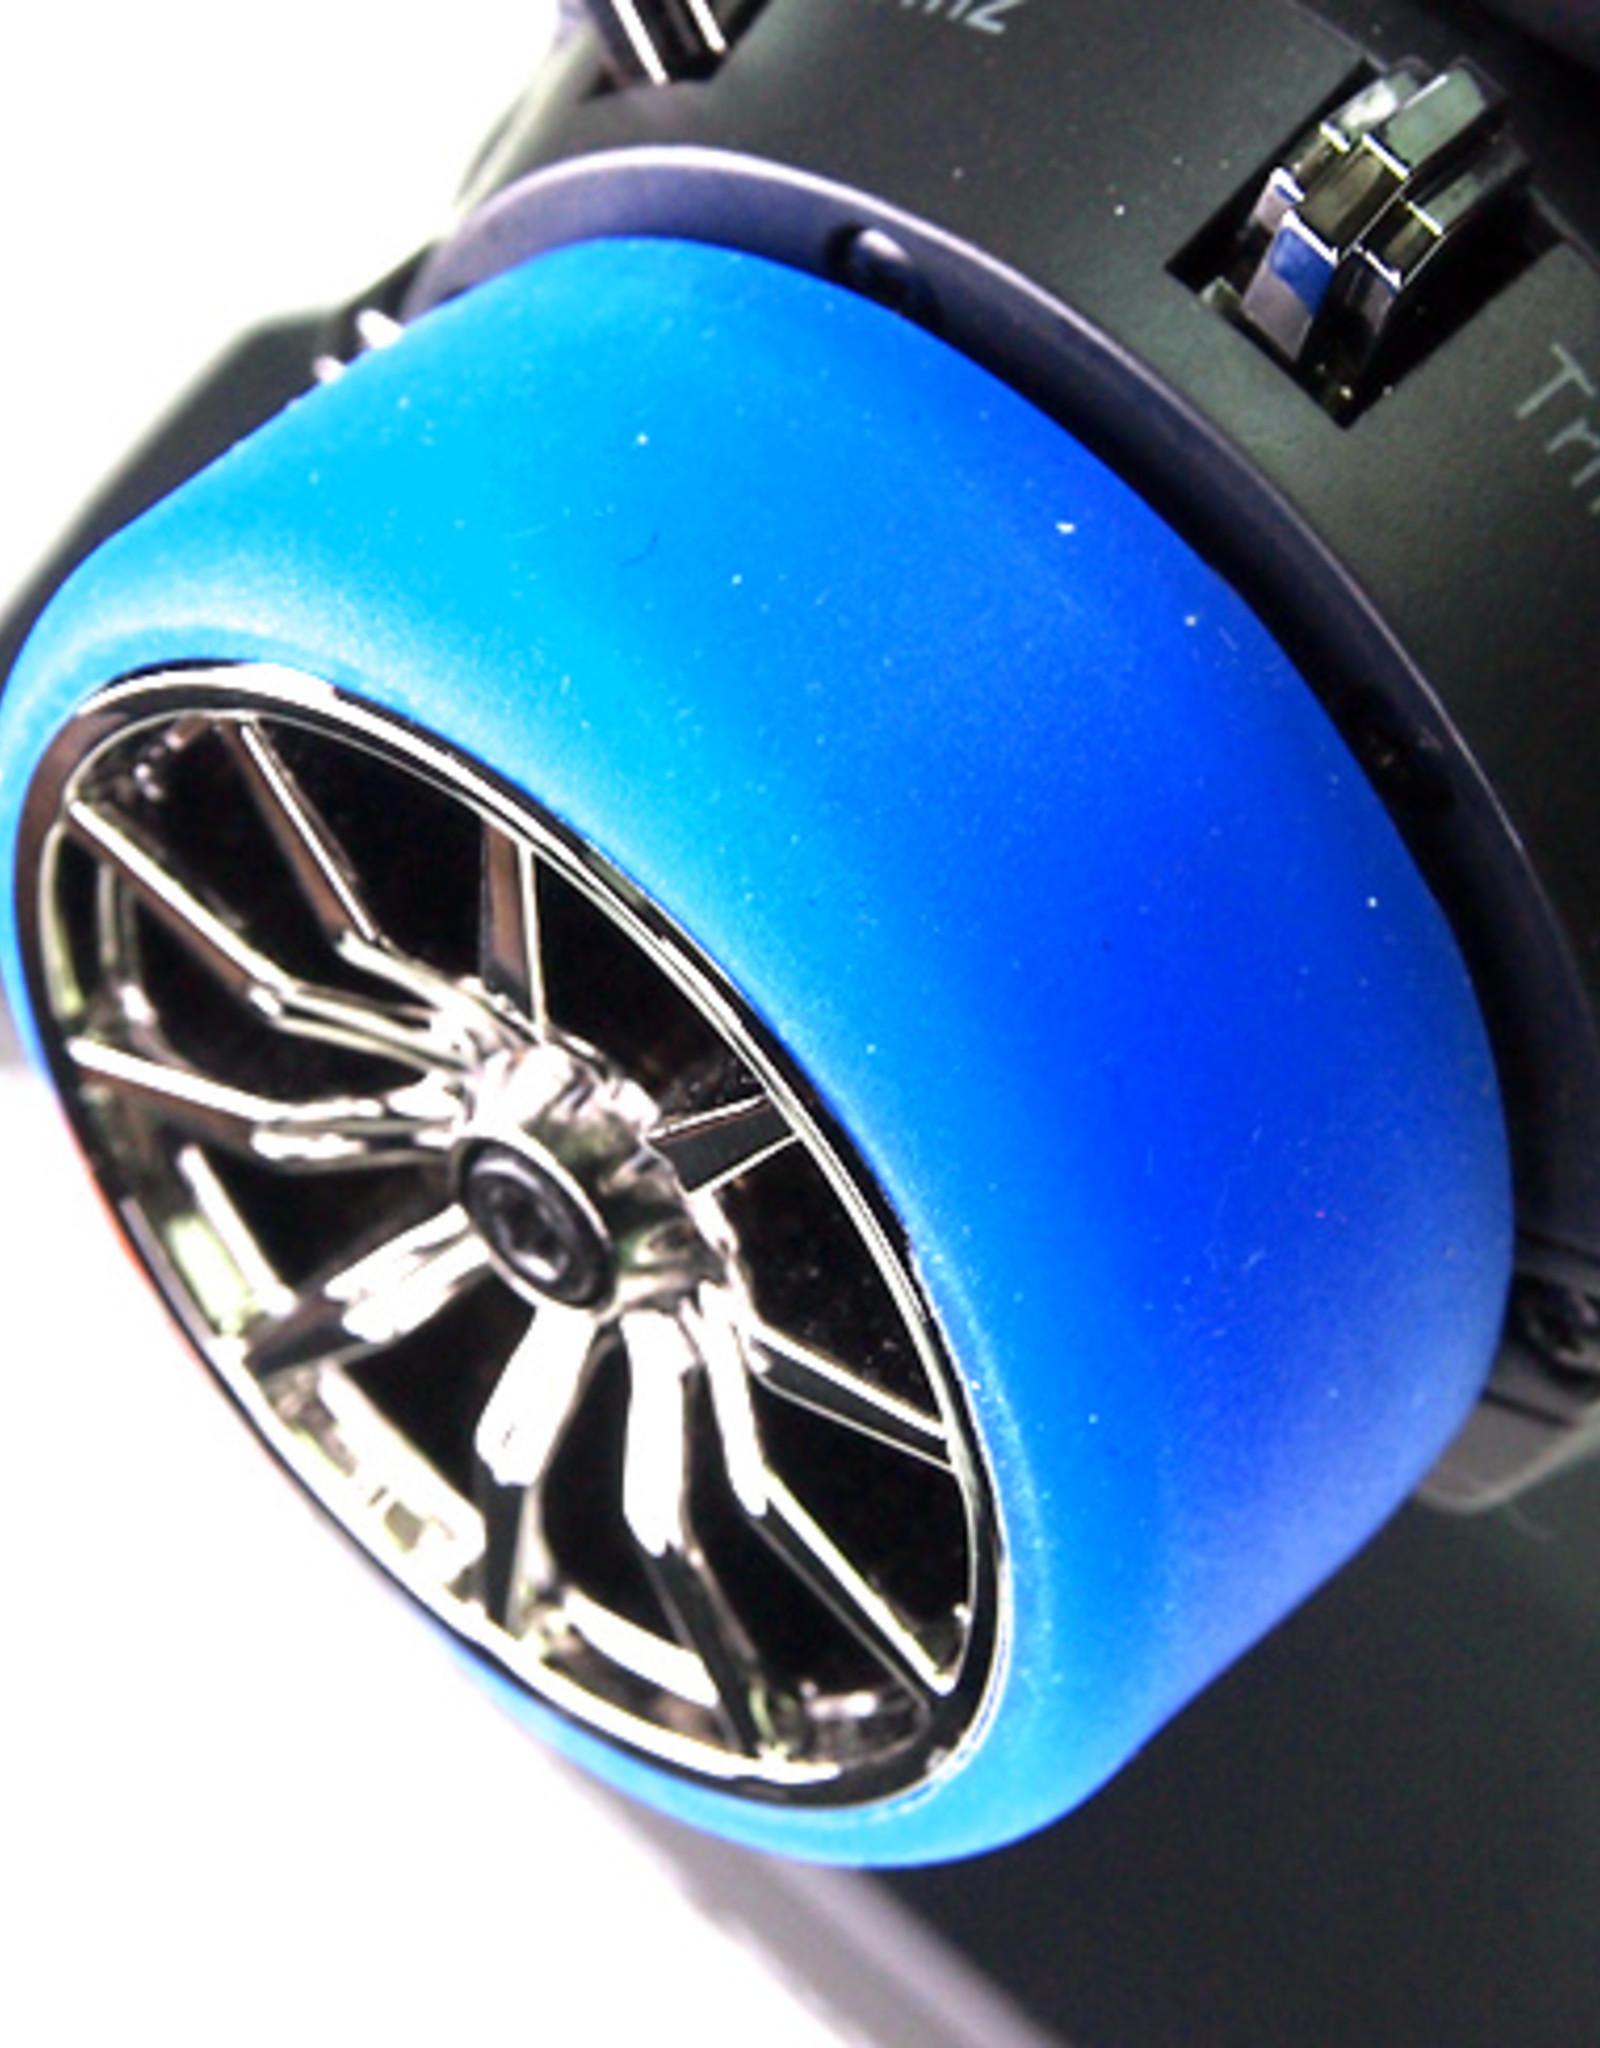 Pn Racing PN Racing Universal Transmitter Steering Wheel Grip (Blue)